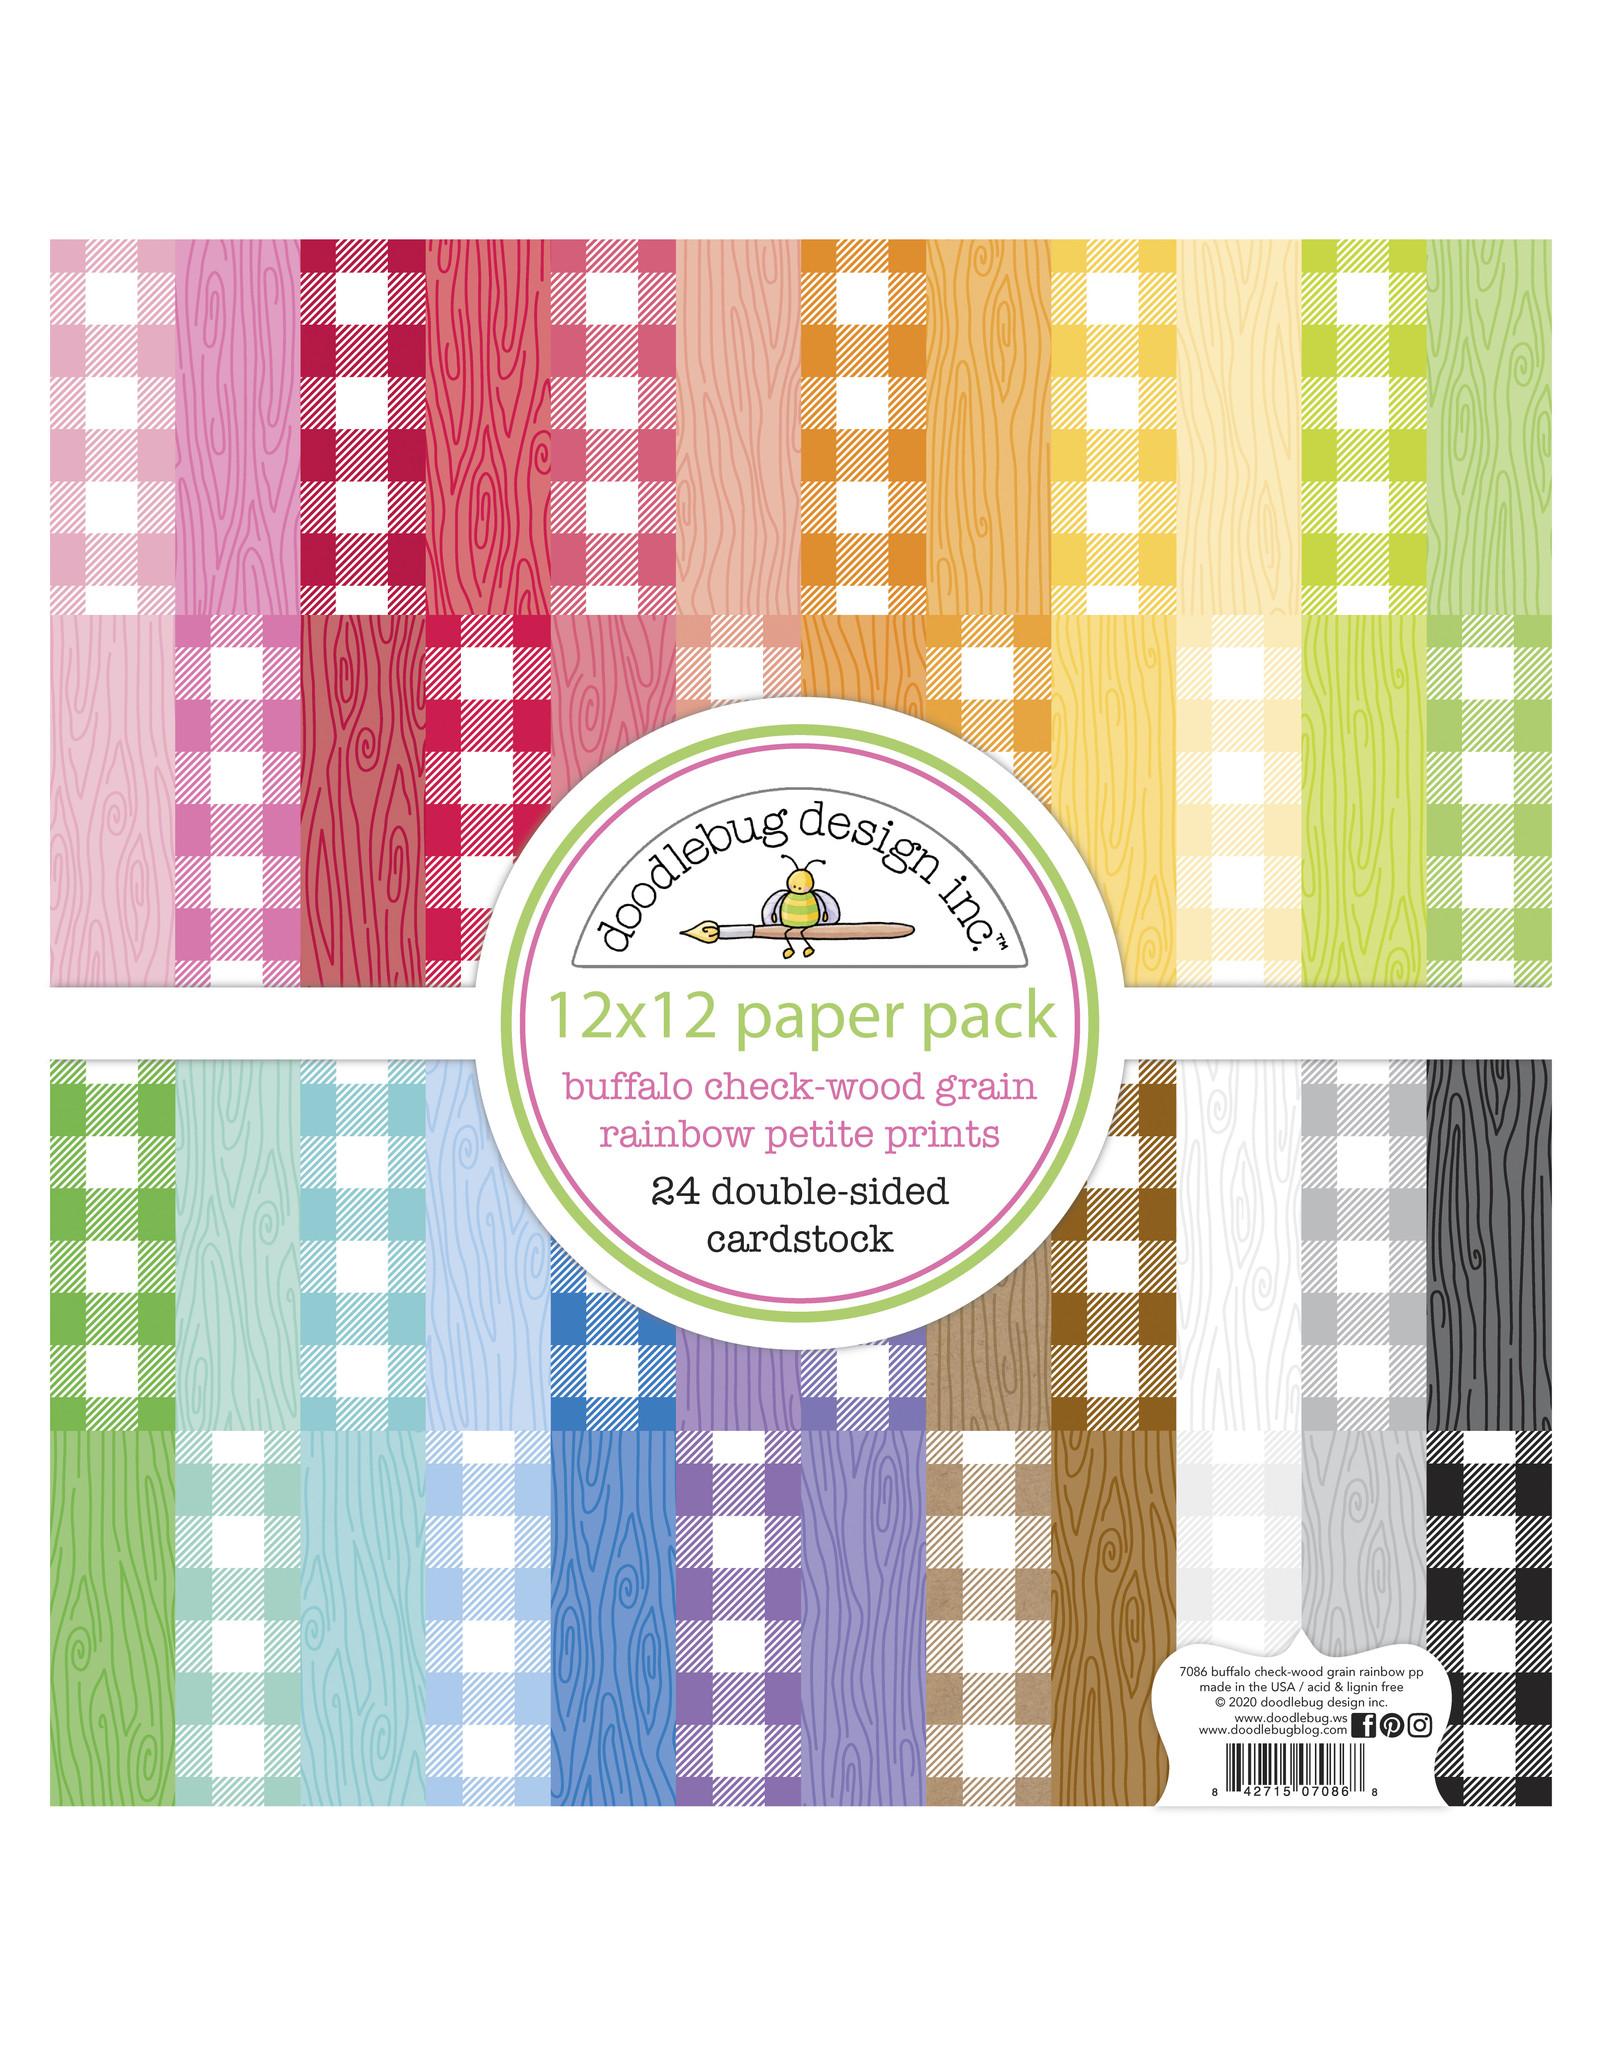 Doodlebug Design buffalo check-woodgrain rainbow petite prints pack